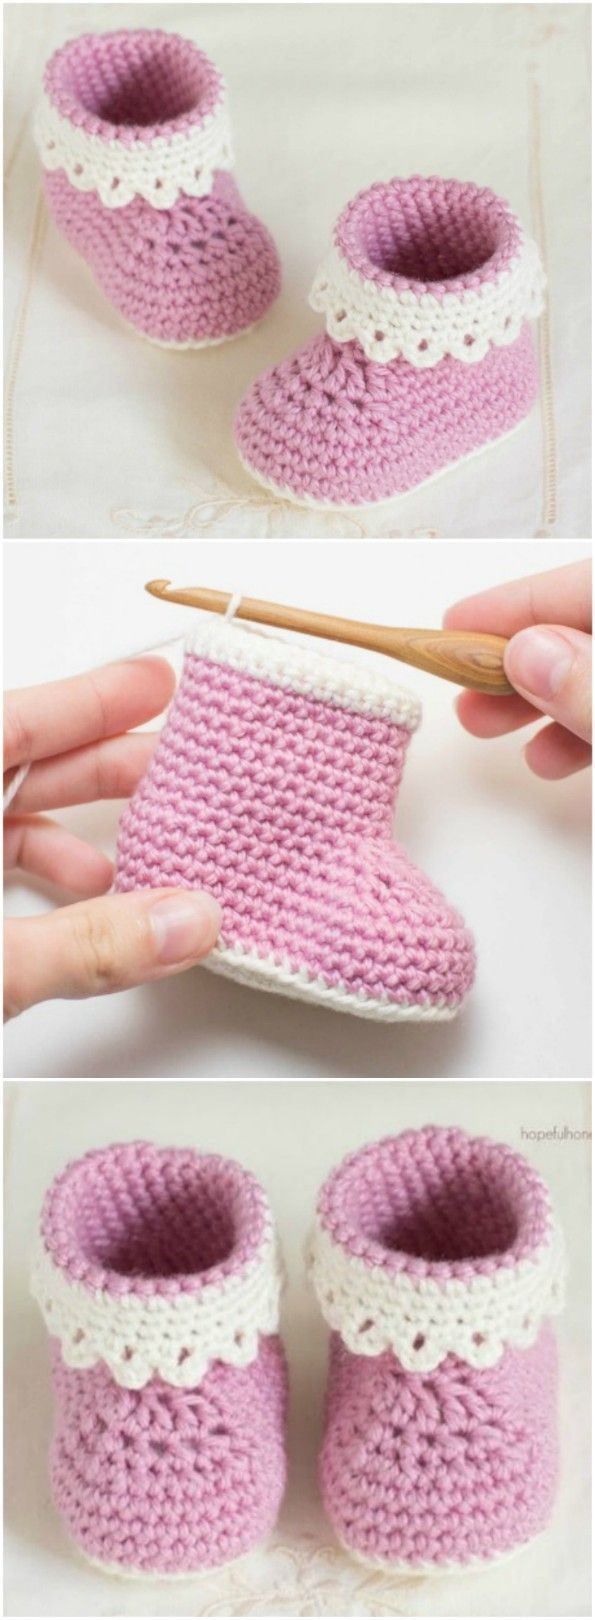 Crochet Baby Booties Pattern Lots of The Sweetest Idea #crochetbabyboots